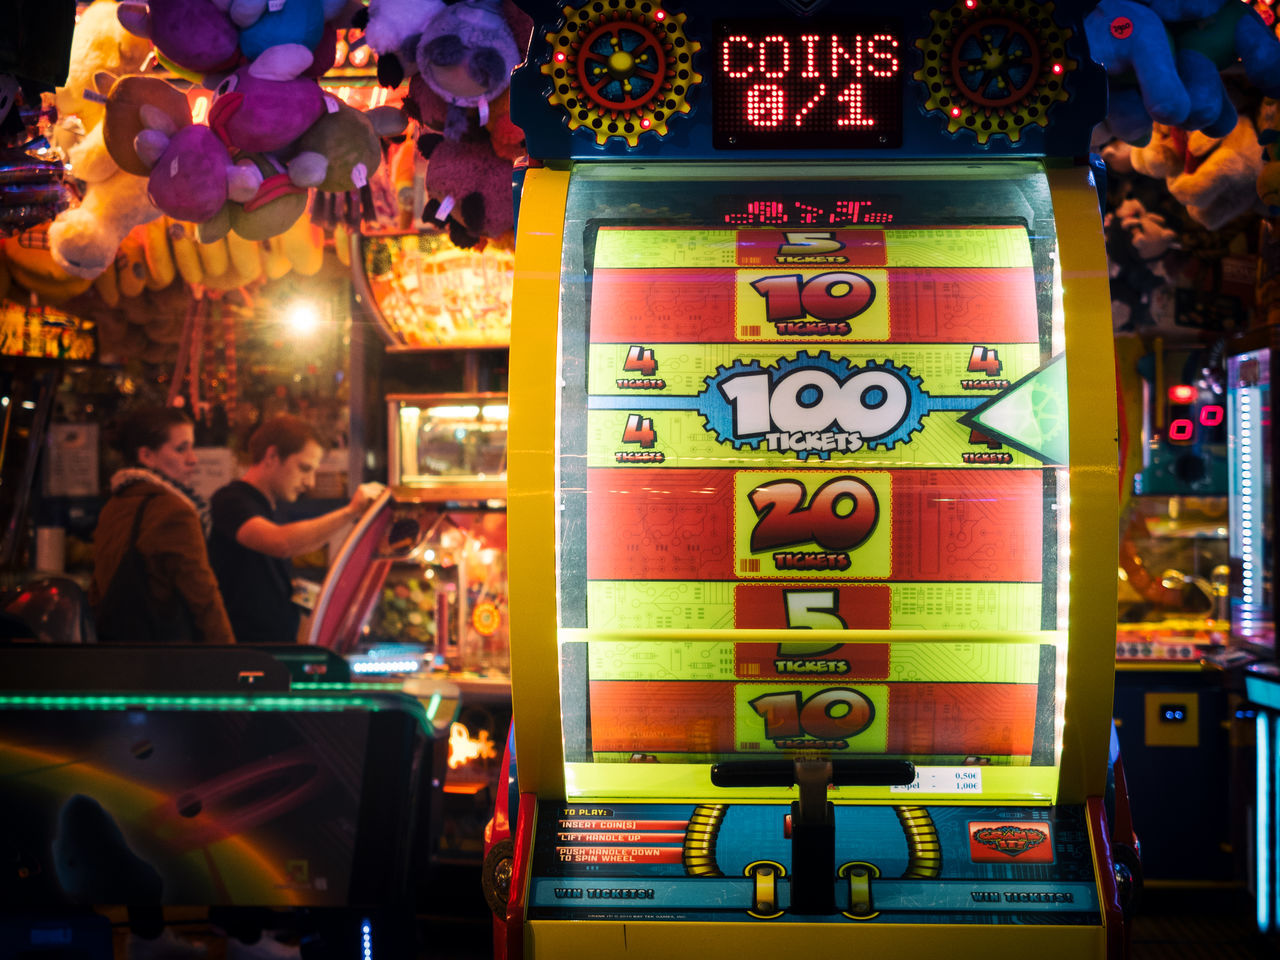 0/1 100 Coins Colors Colorsplash Couple Gambling Man Night Numbers Slot Machine Slot Machines Woman